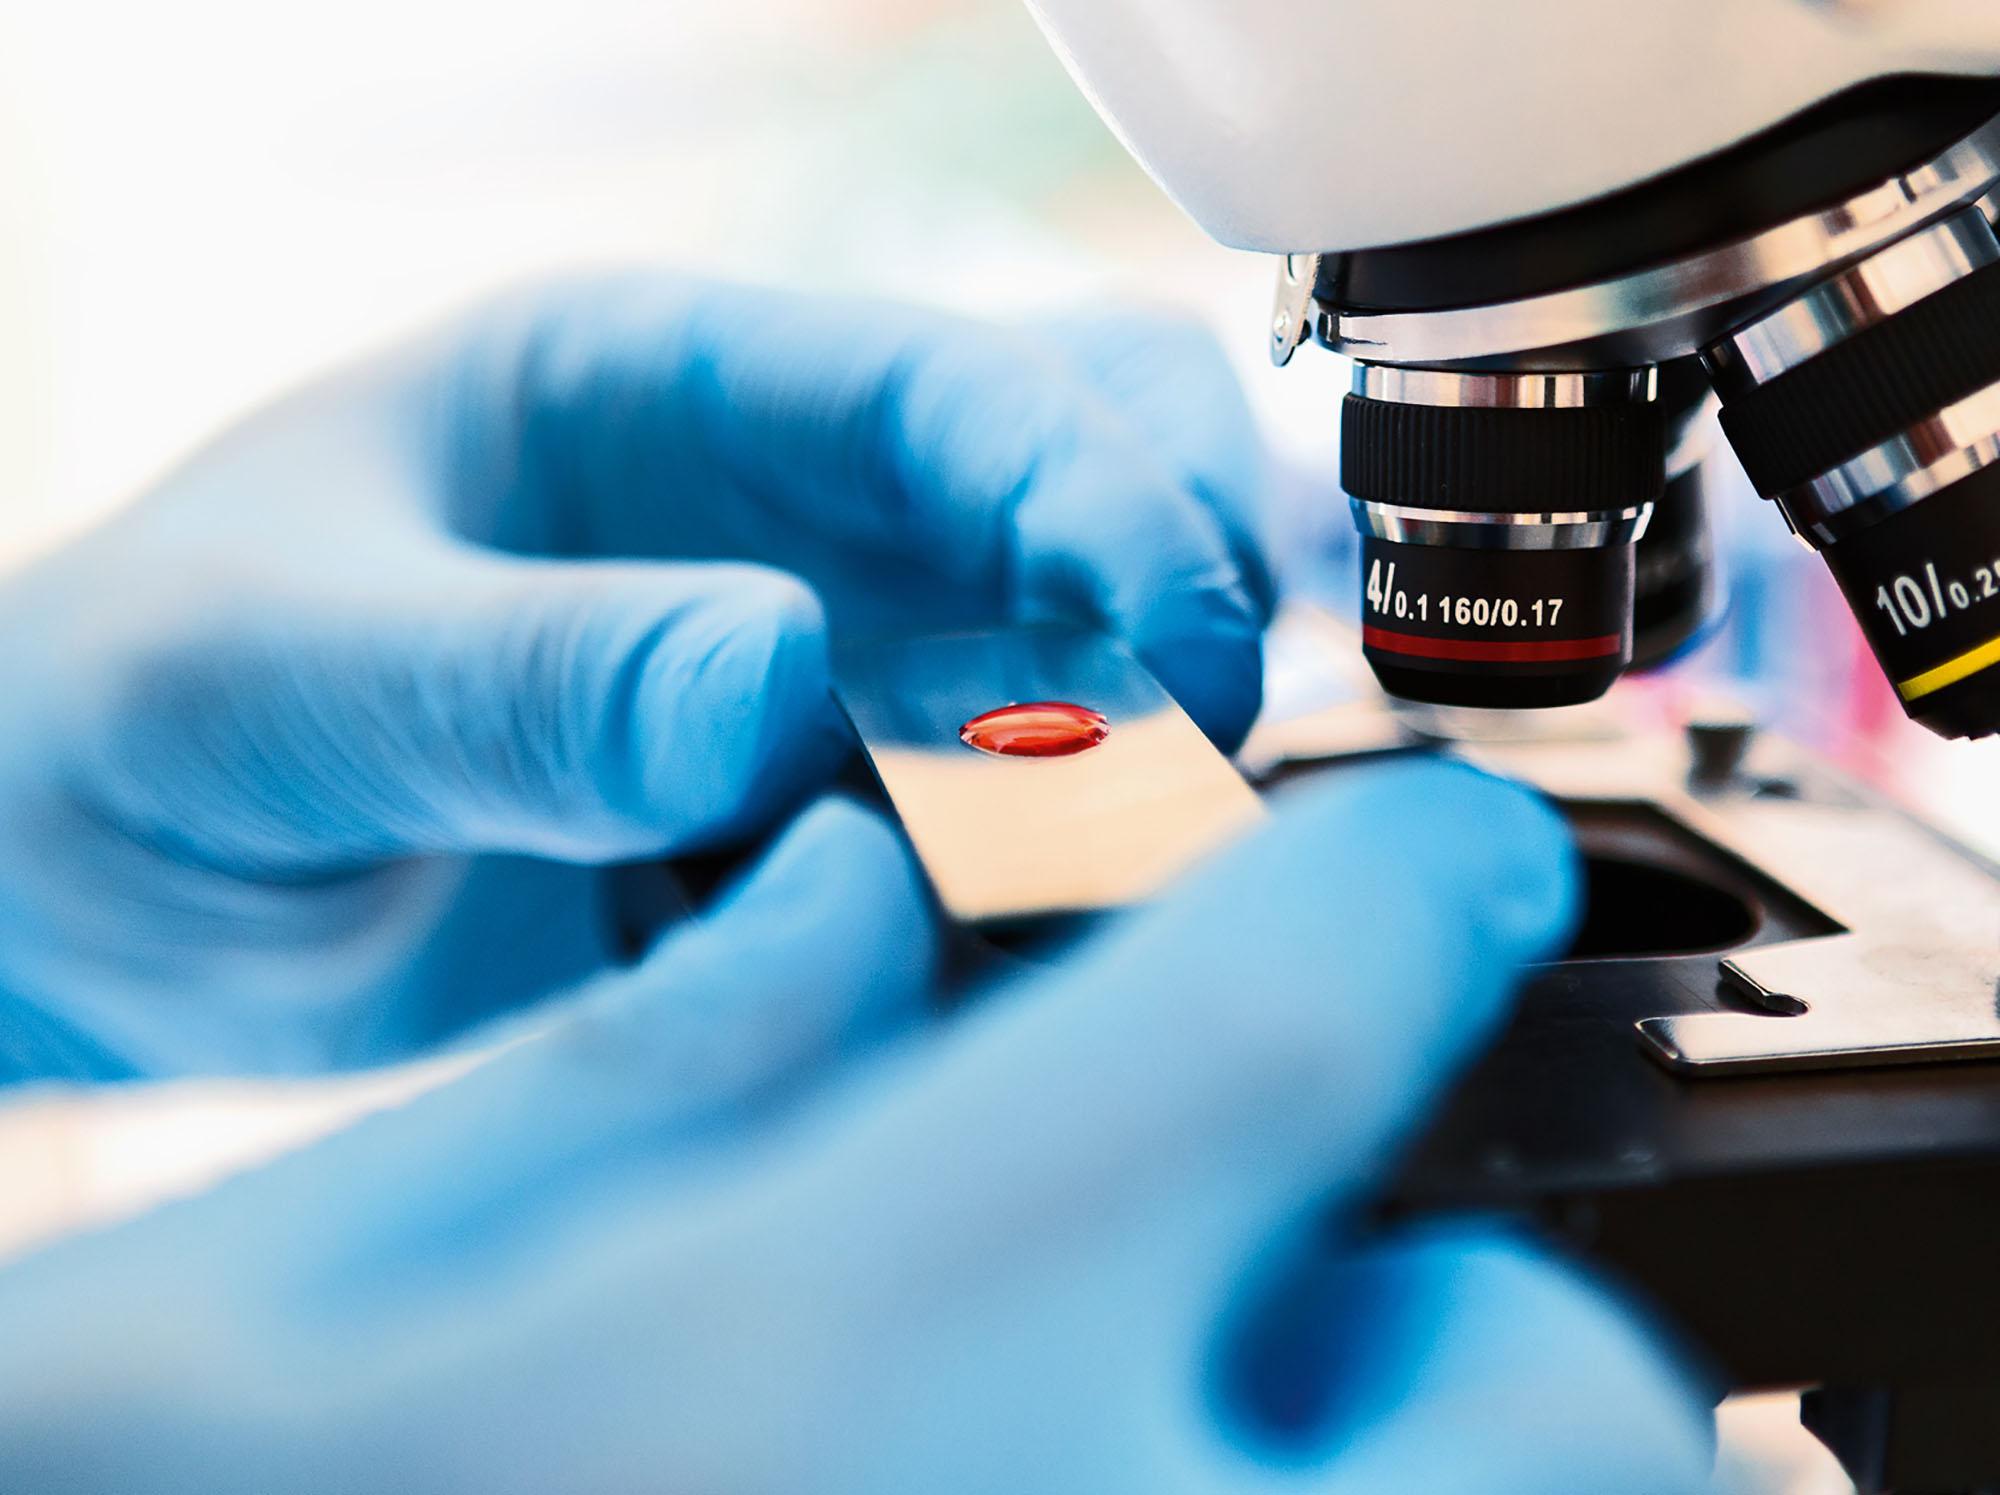 Hands on microscope